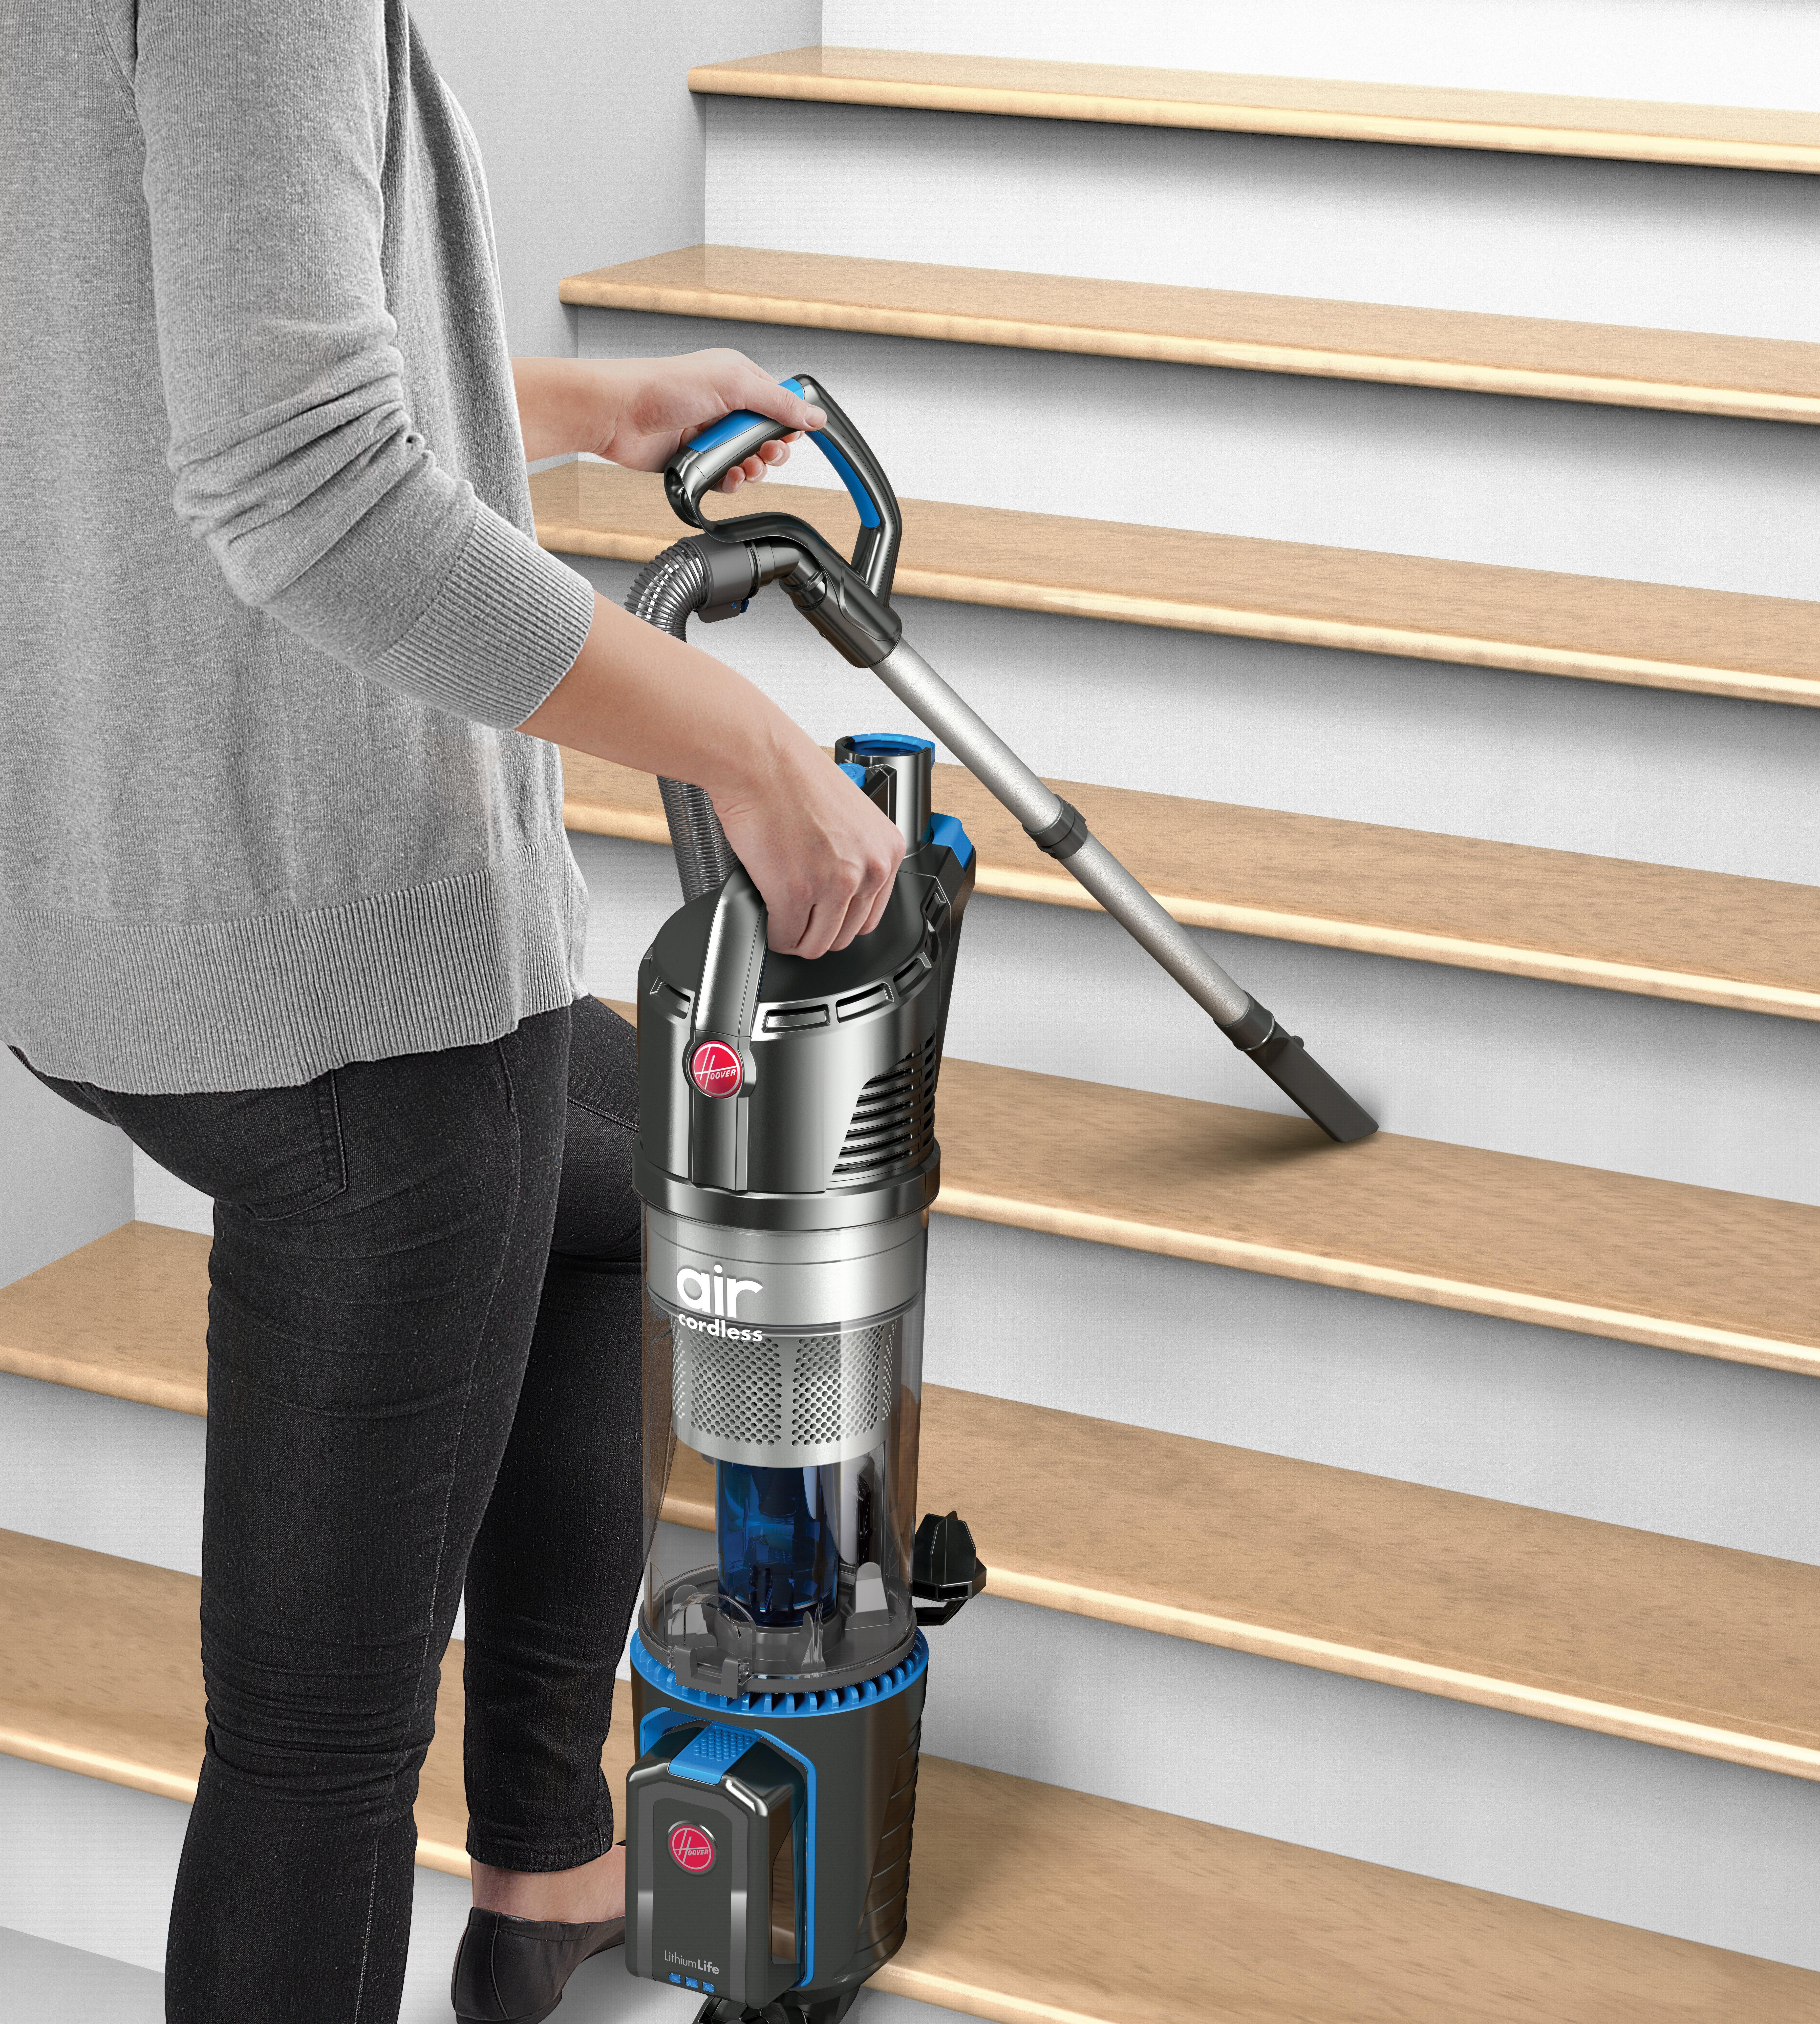 Air Cordless Series 3.0 Upright Vacuum5